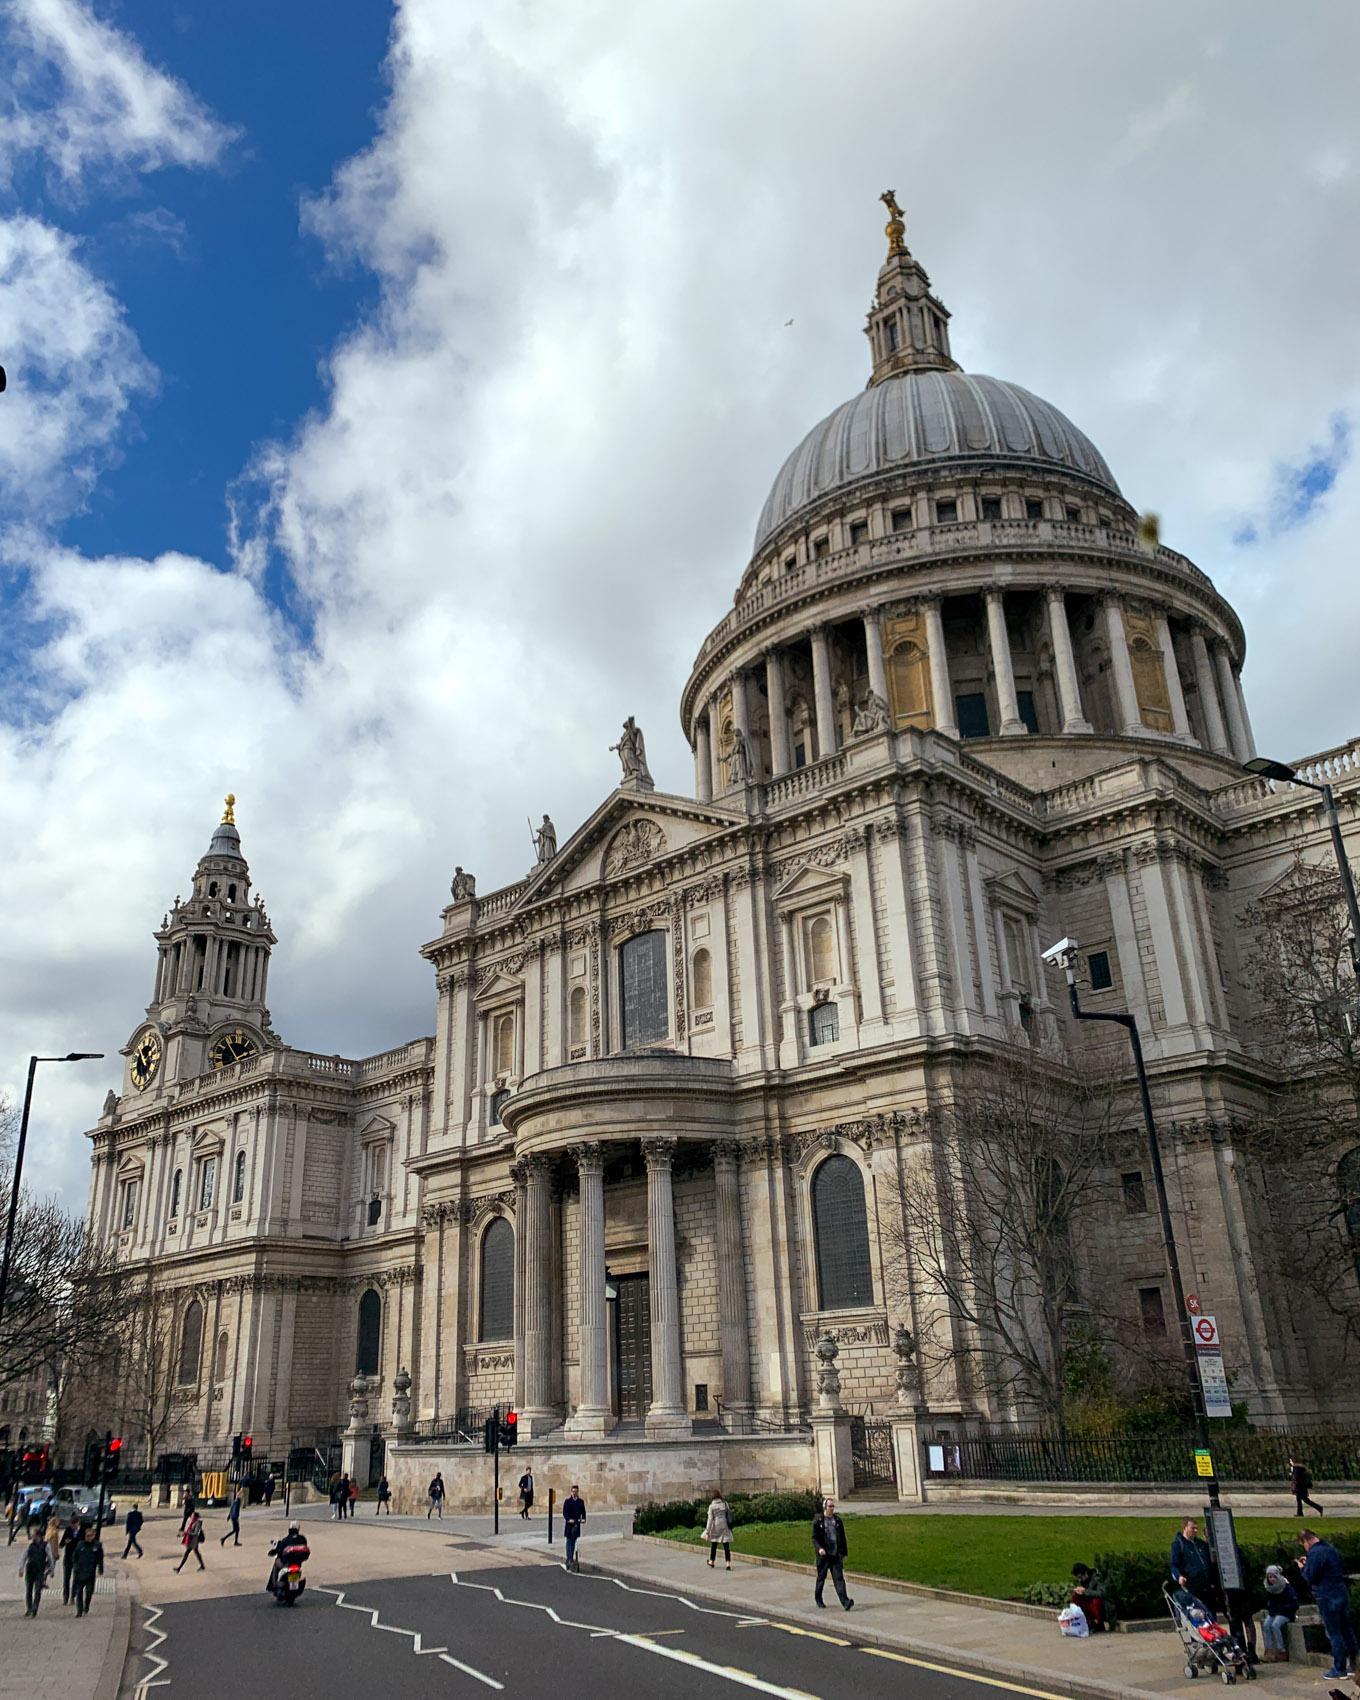 Lontoo - London - St. Paul's-1